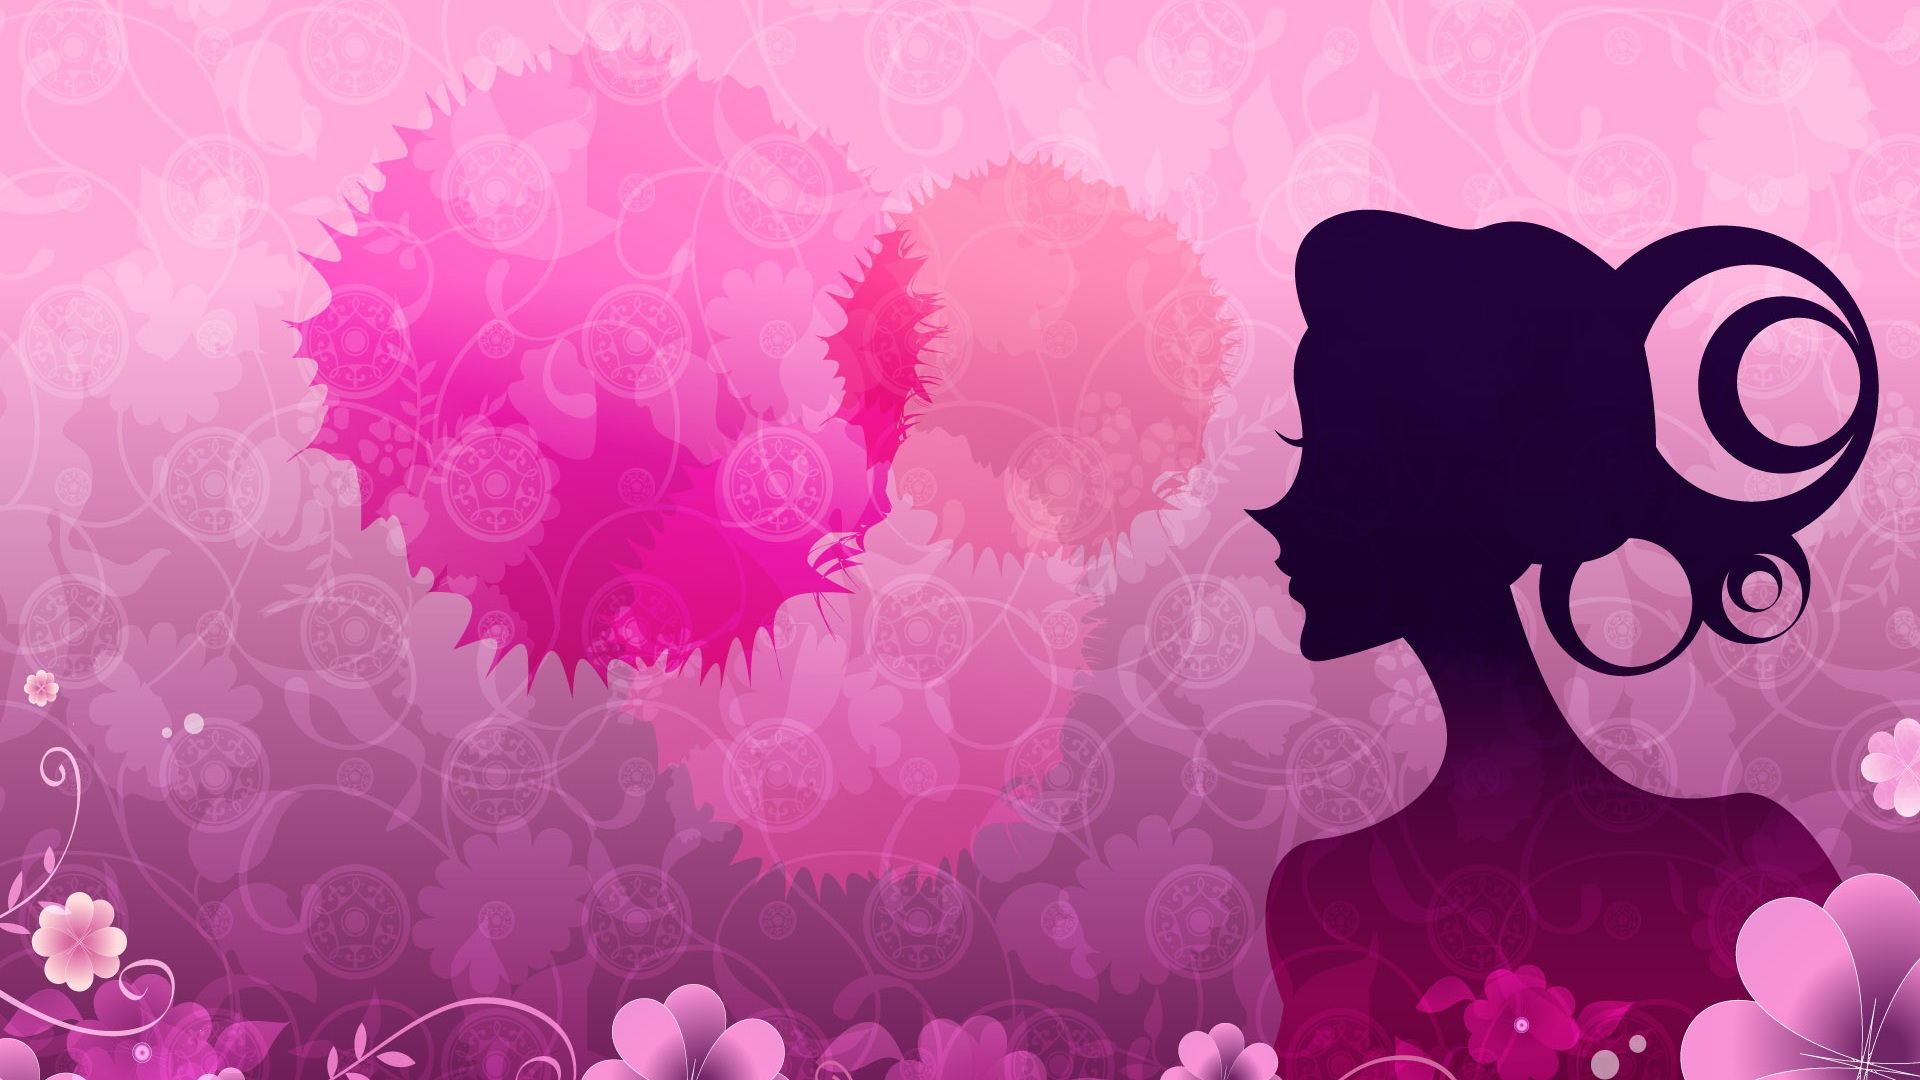 Wallpaper download girly - Funmozar Cool Cute Girly Wallpapers